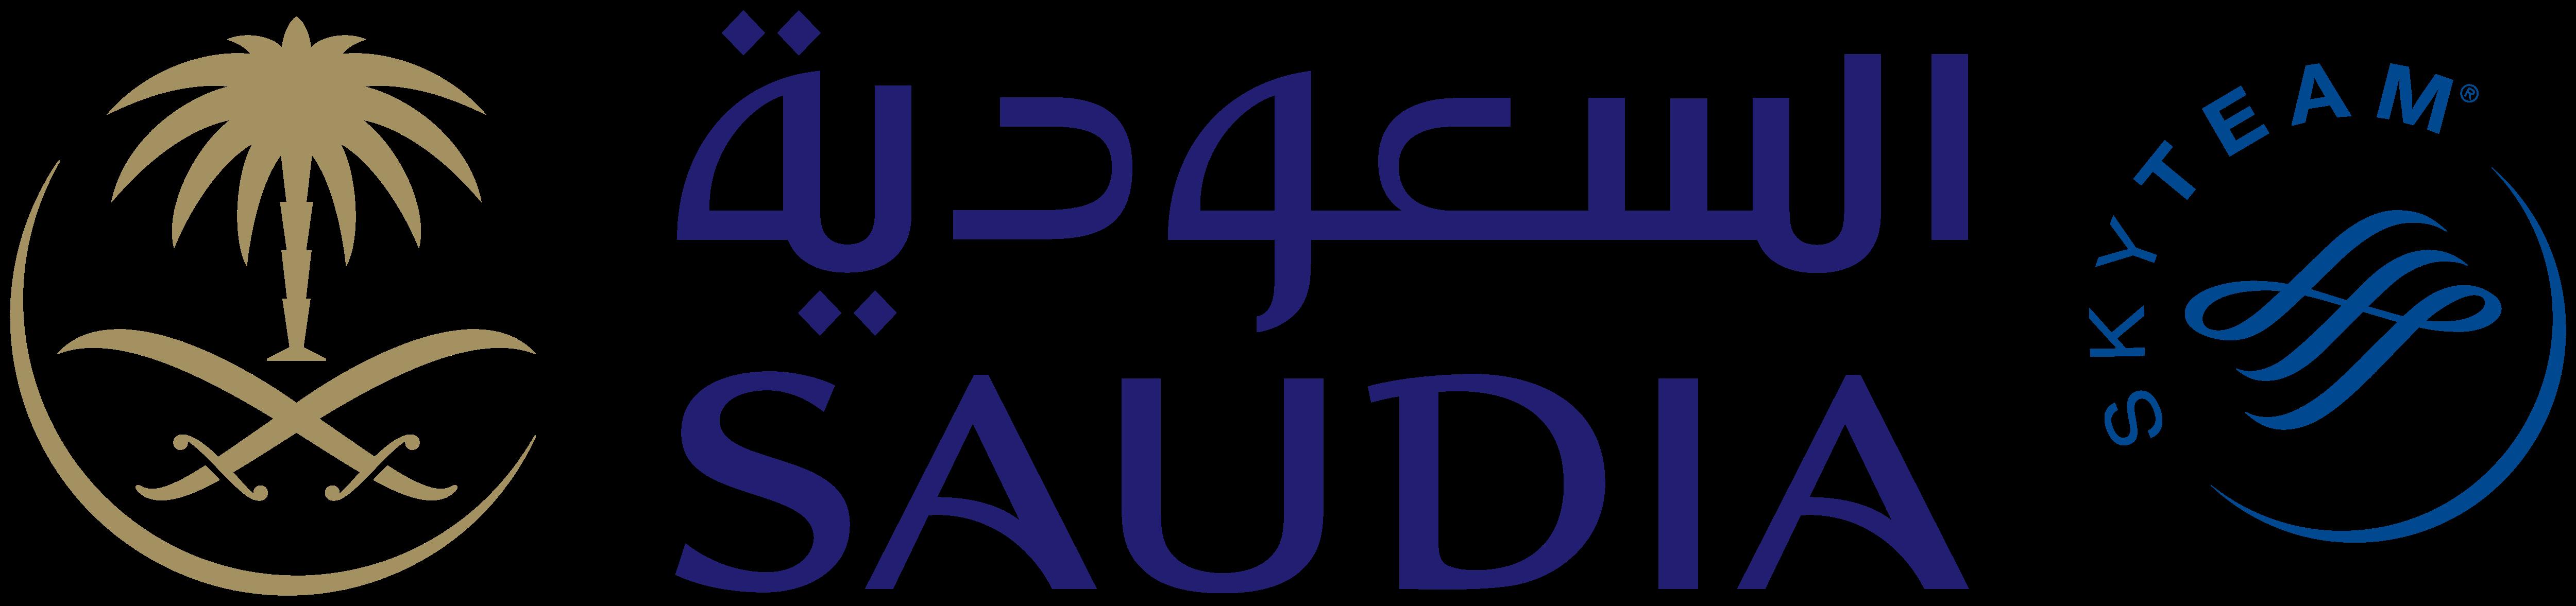 Saudia_logo_logotype